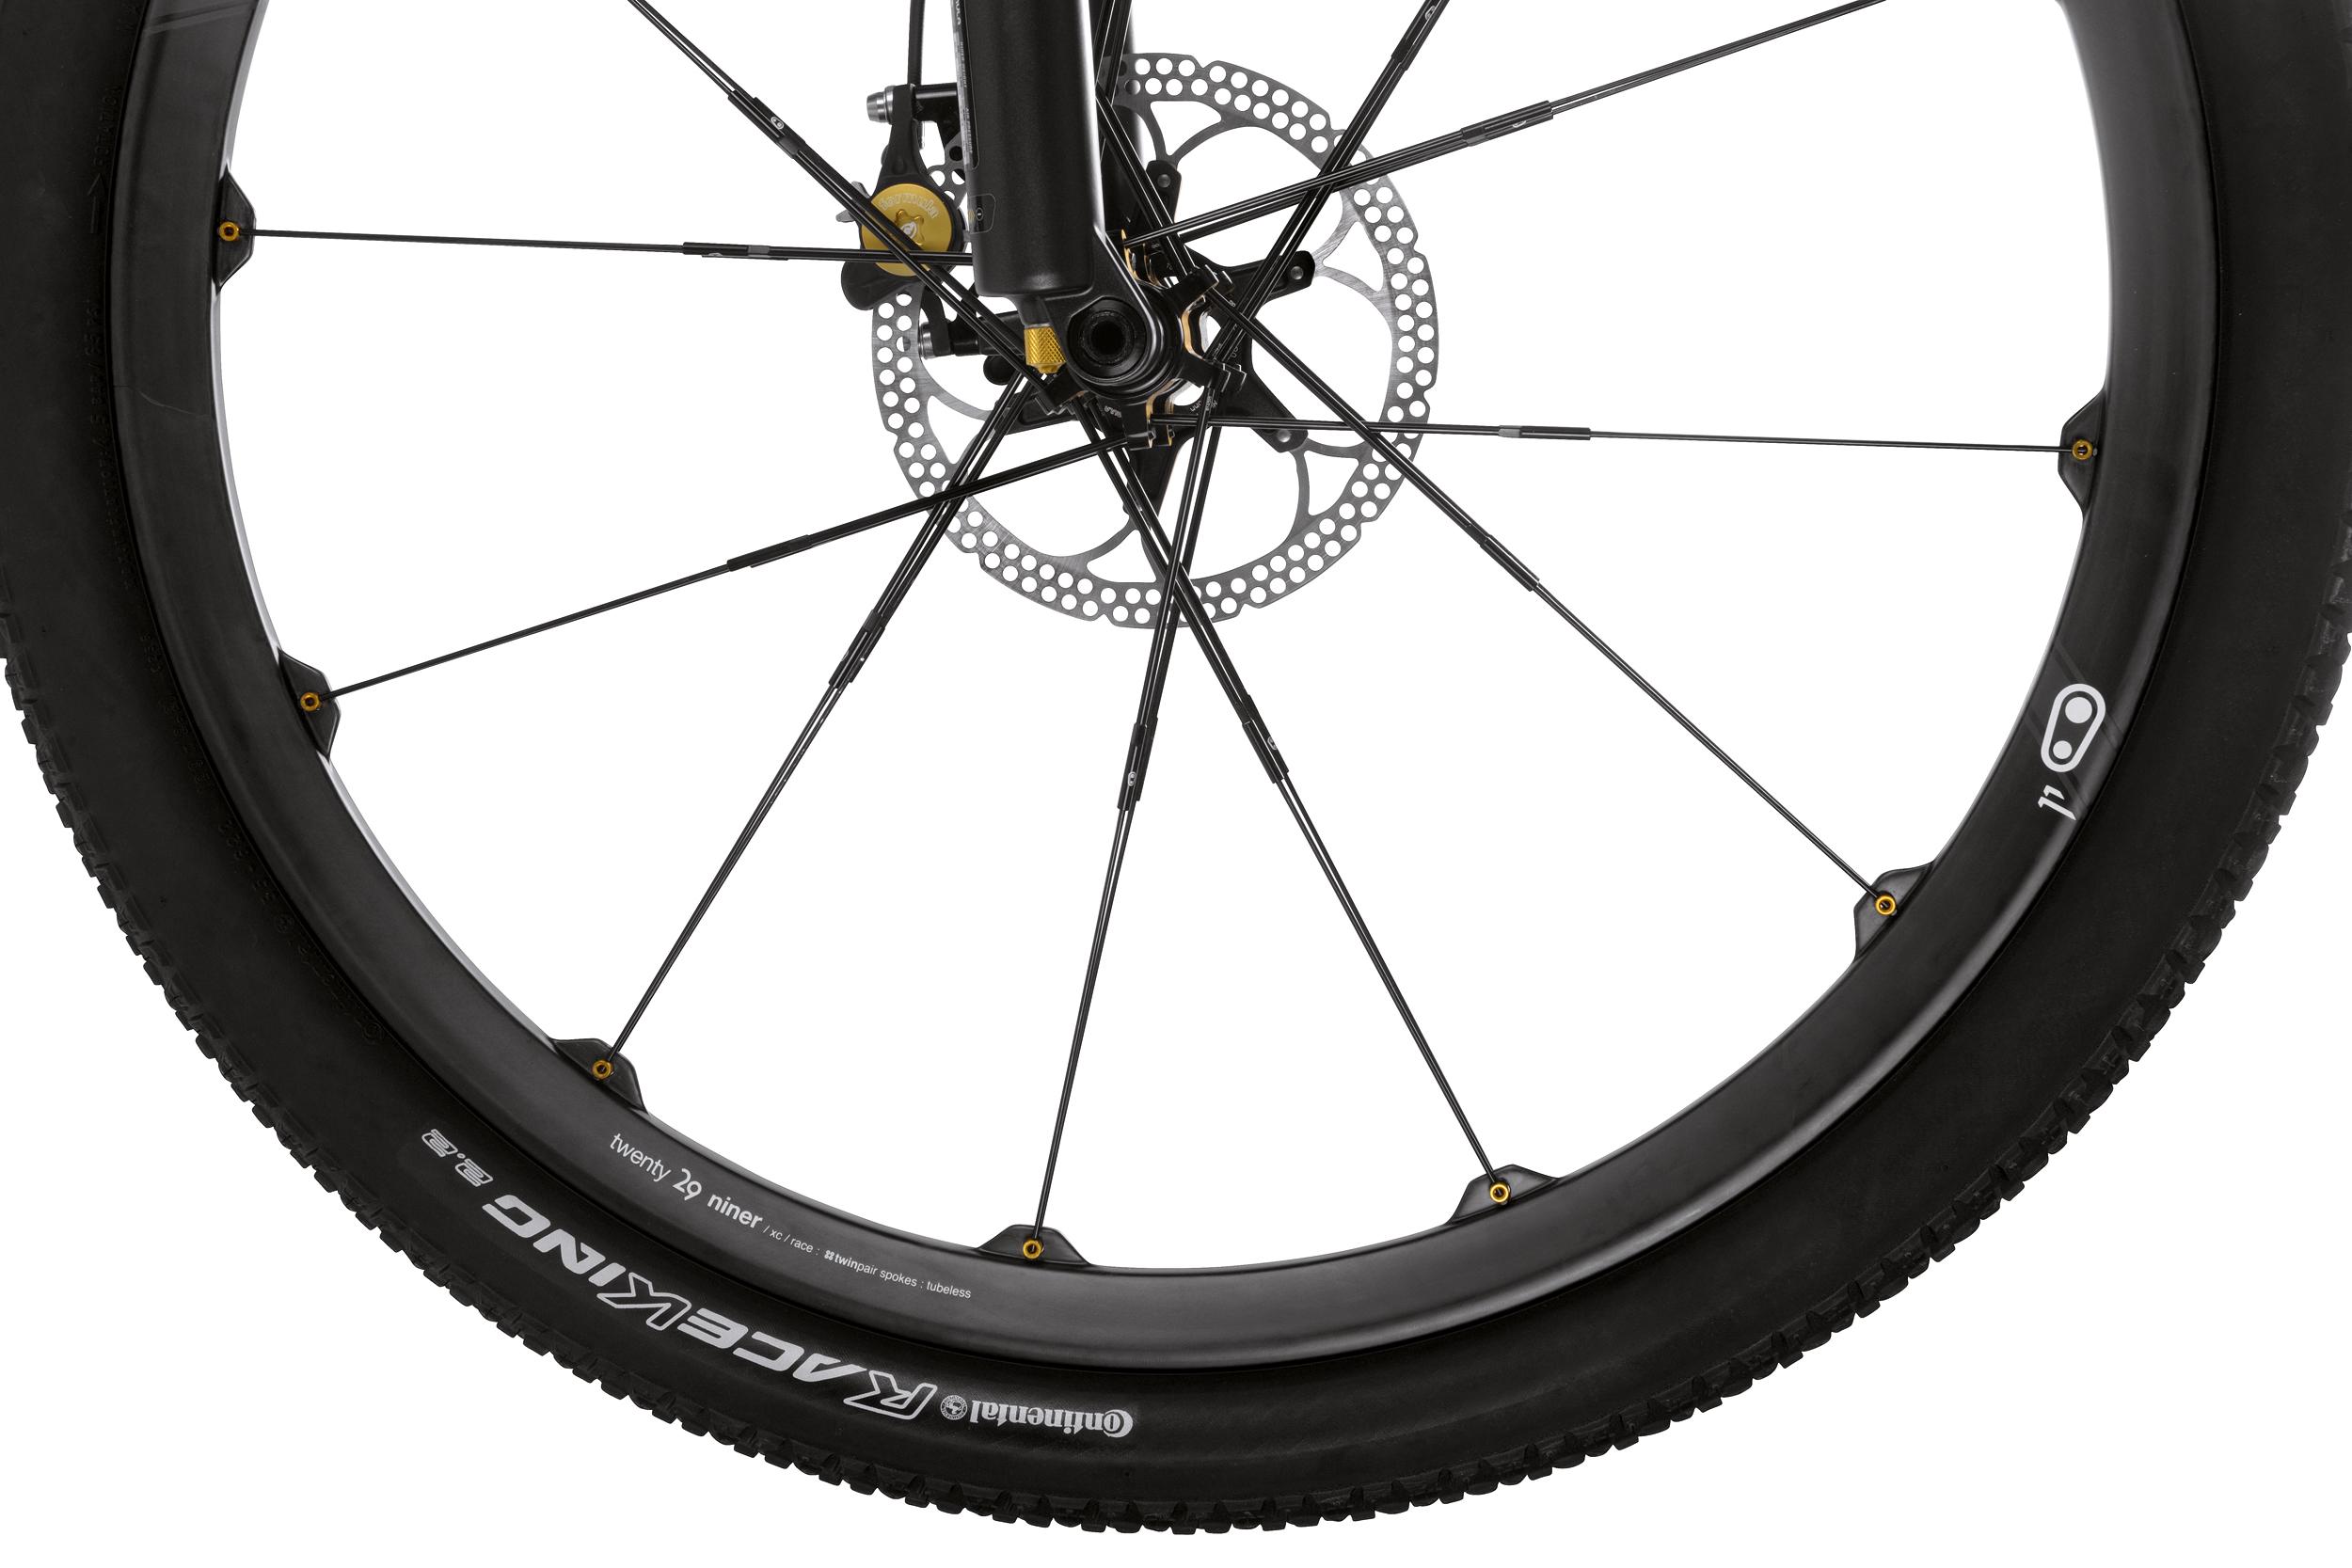 rotwild-gt-s-detail-05-wheelset